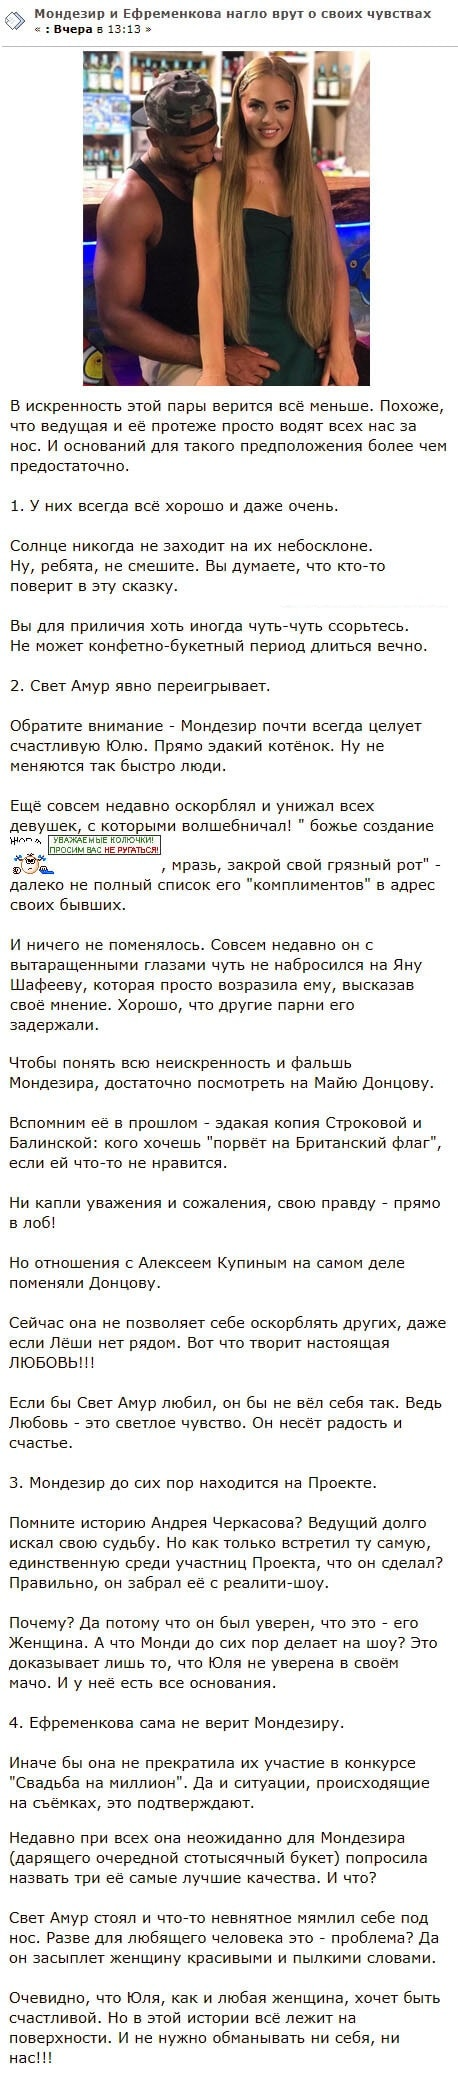 Юлия Ефременкова и Мондезир Свет-Амур нагло врут